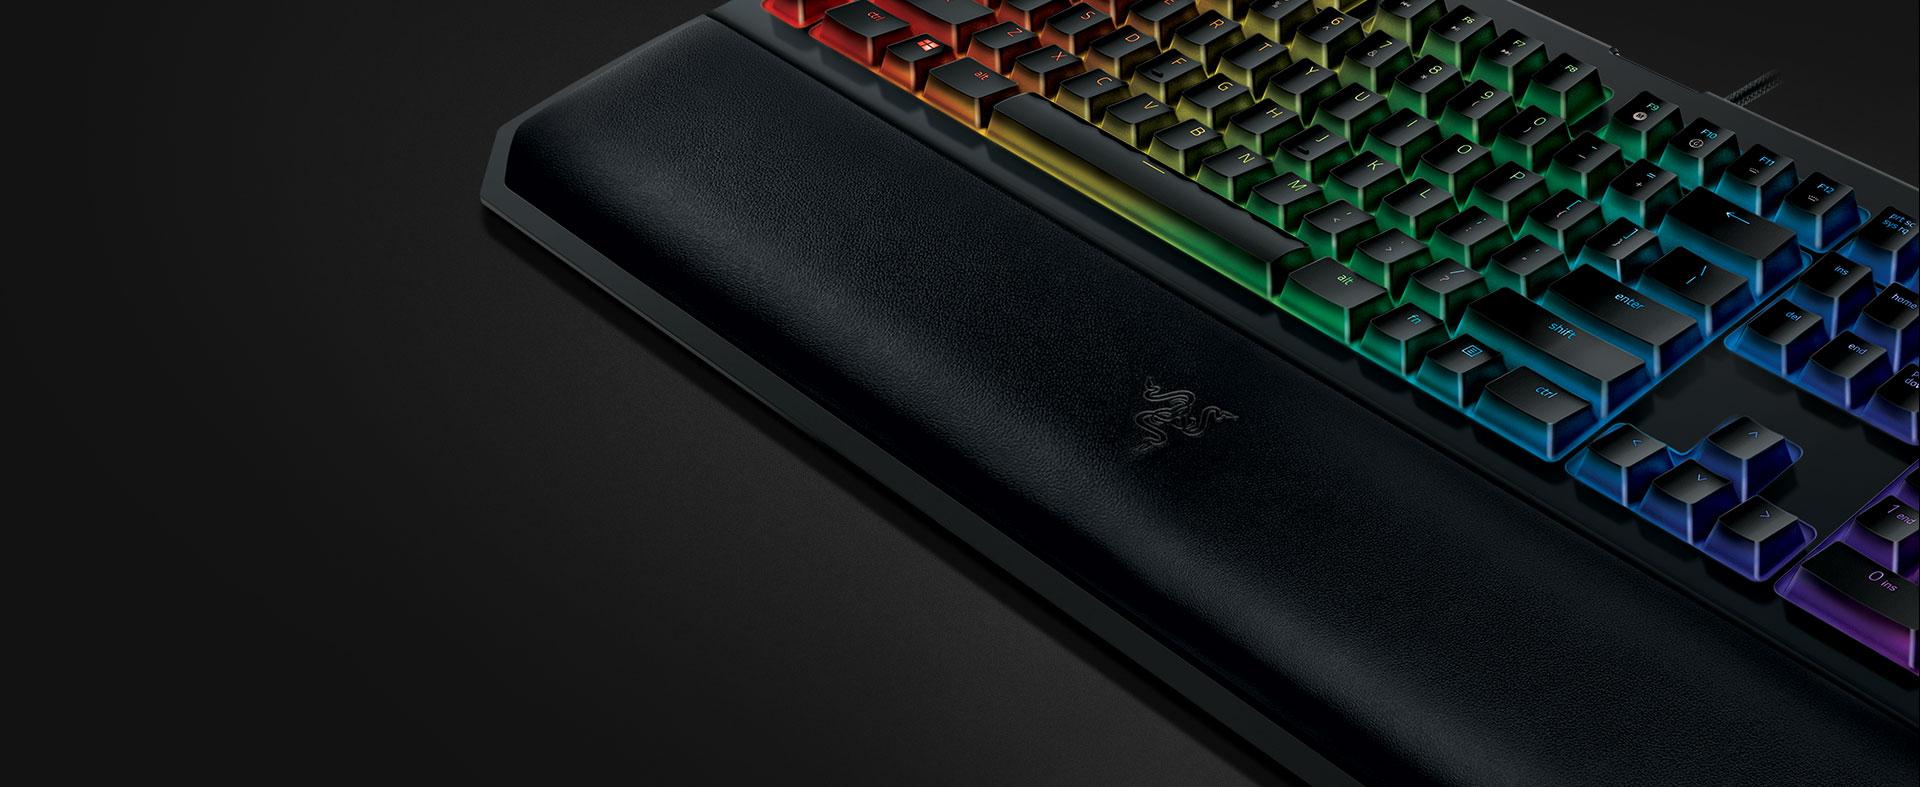 Razer Blackwidow Chroma V2 Review - Deluxe Keyboard